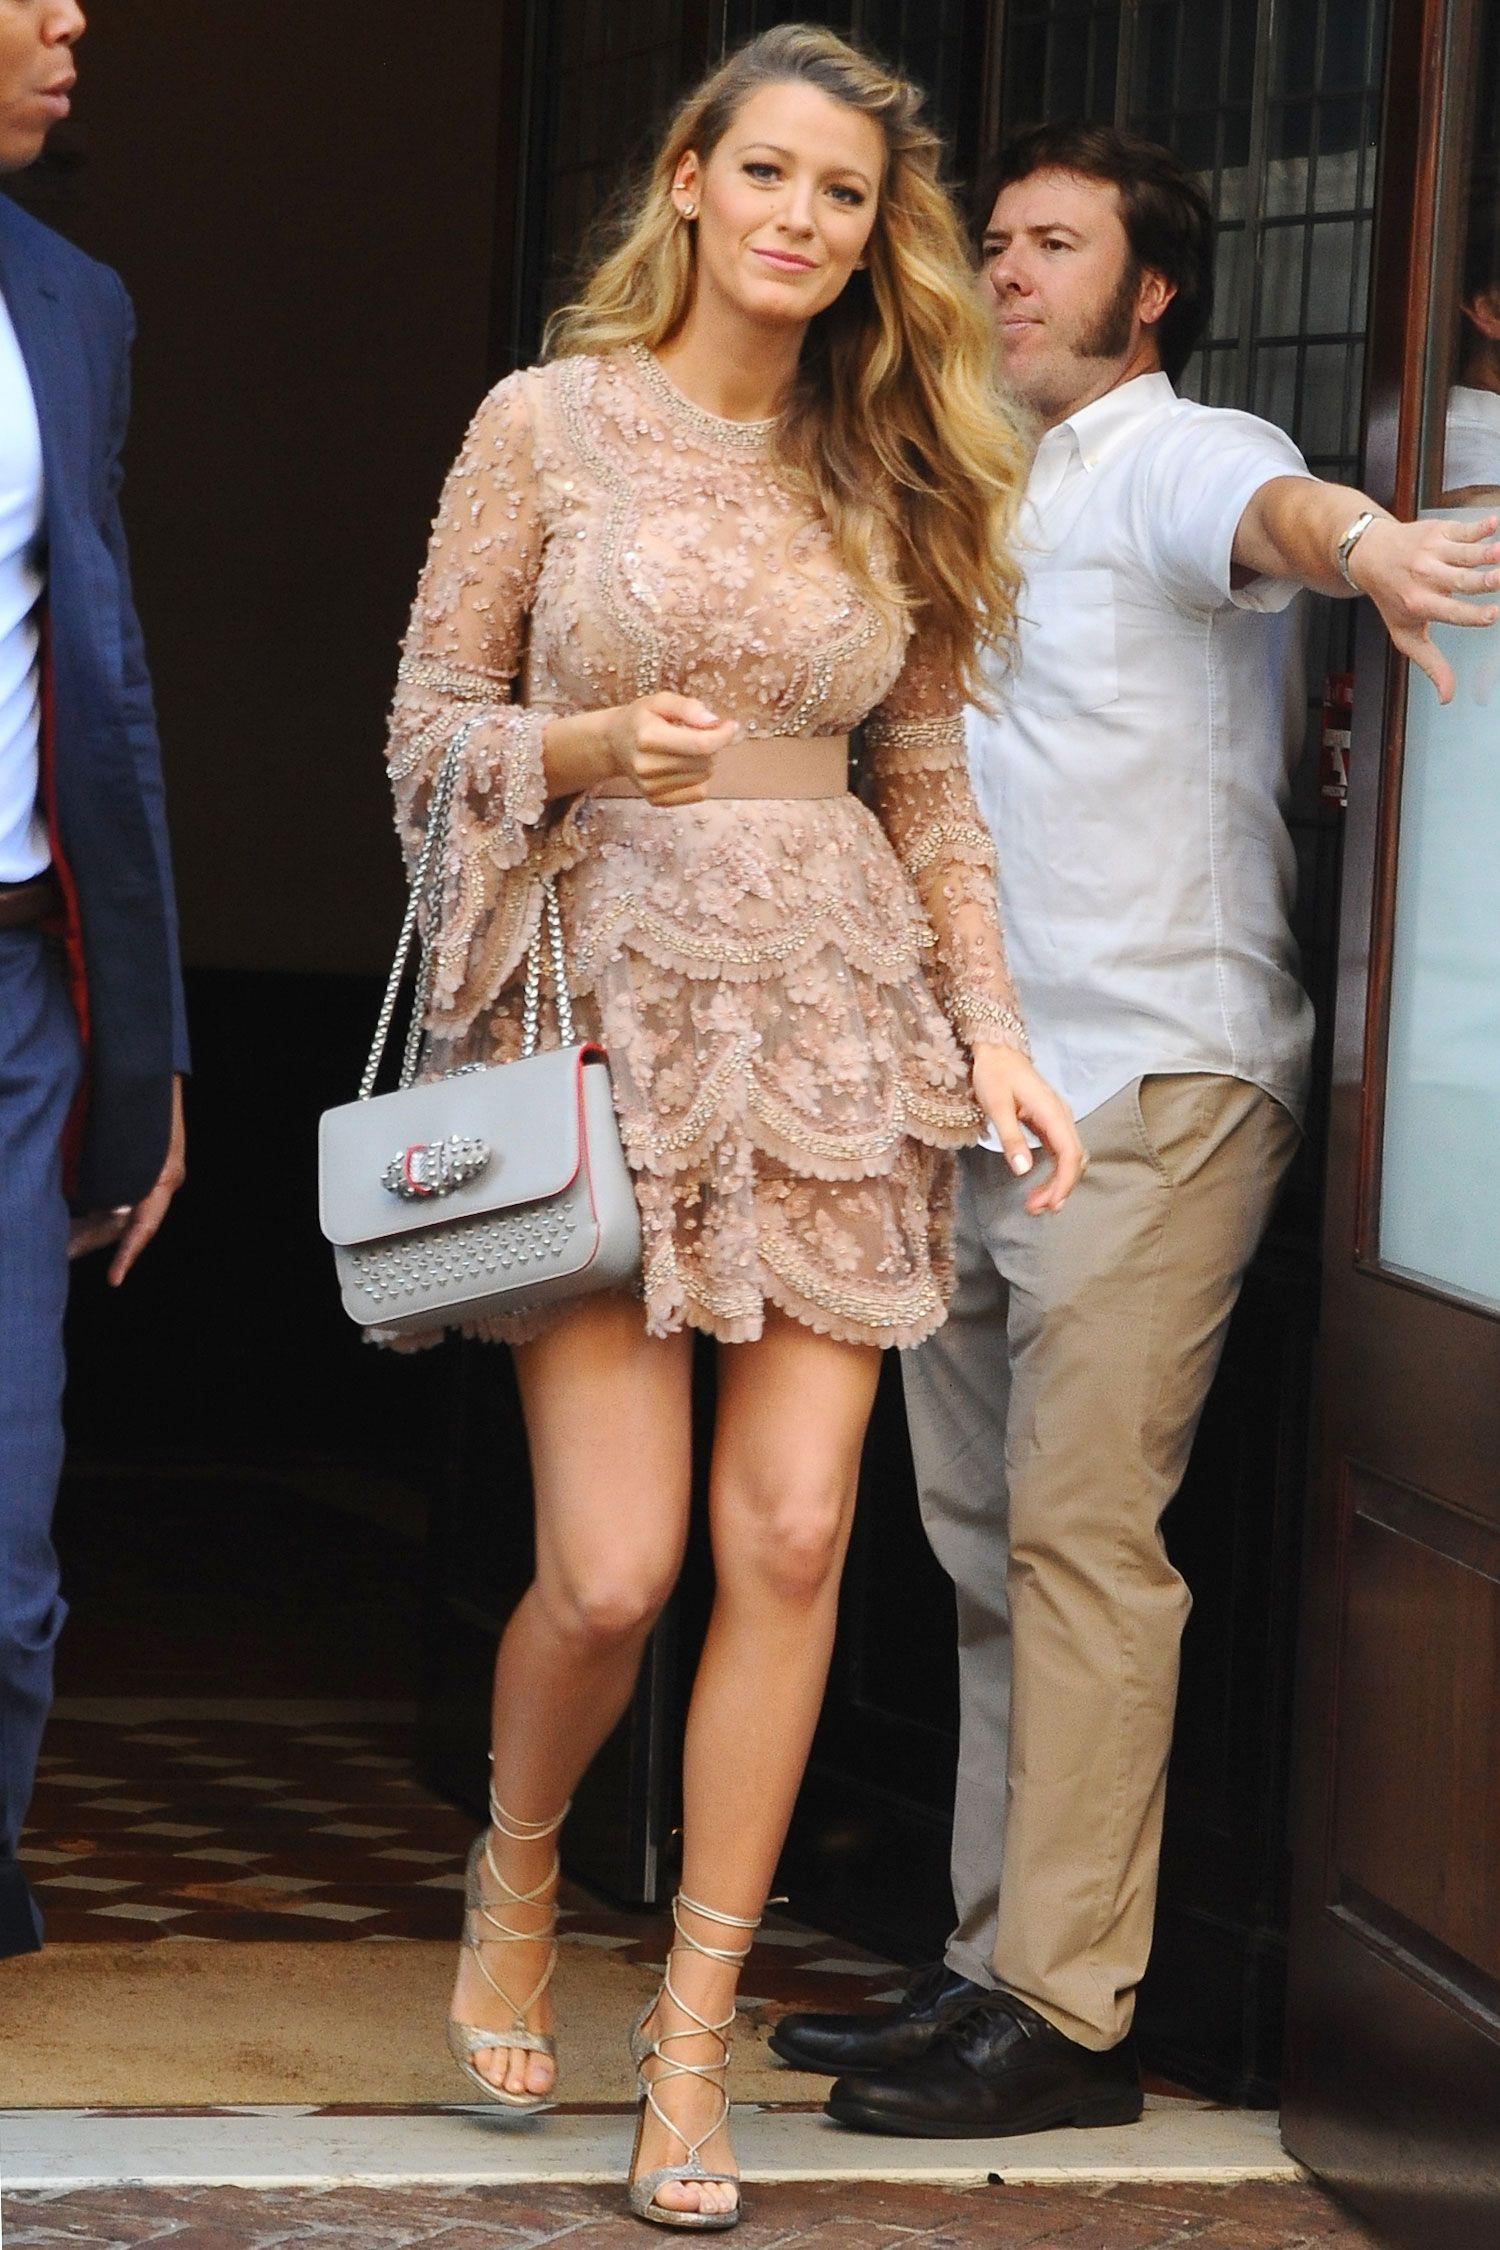 c3239b2ae2b Blake Lively Pregnancy Style - Blake Lively Fashion